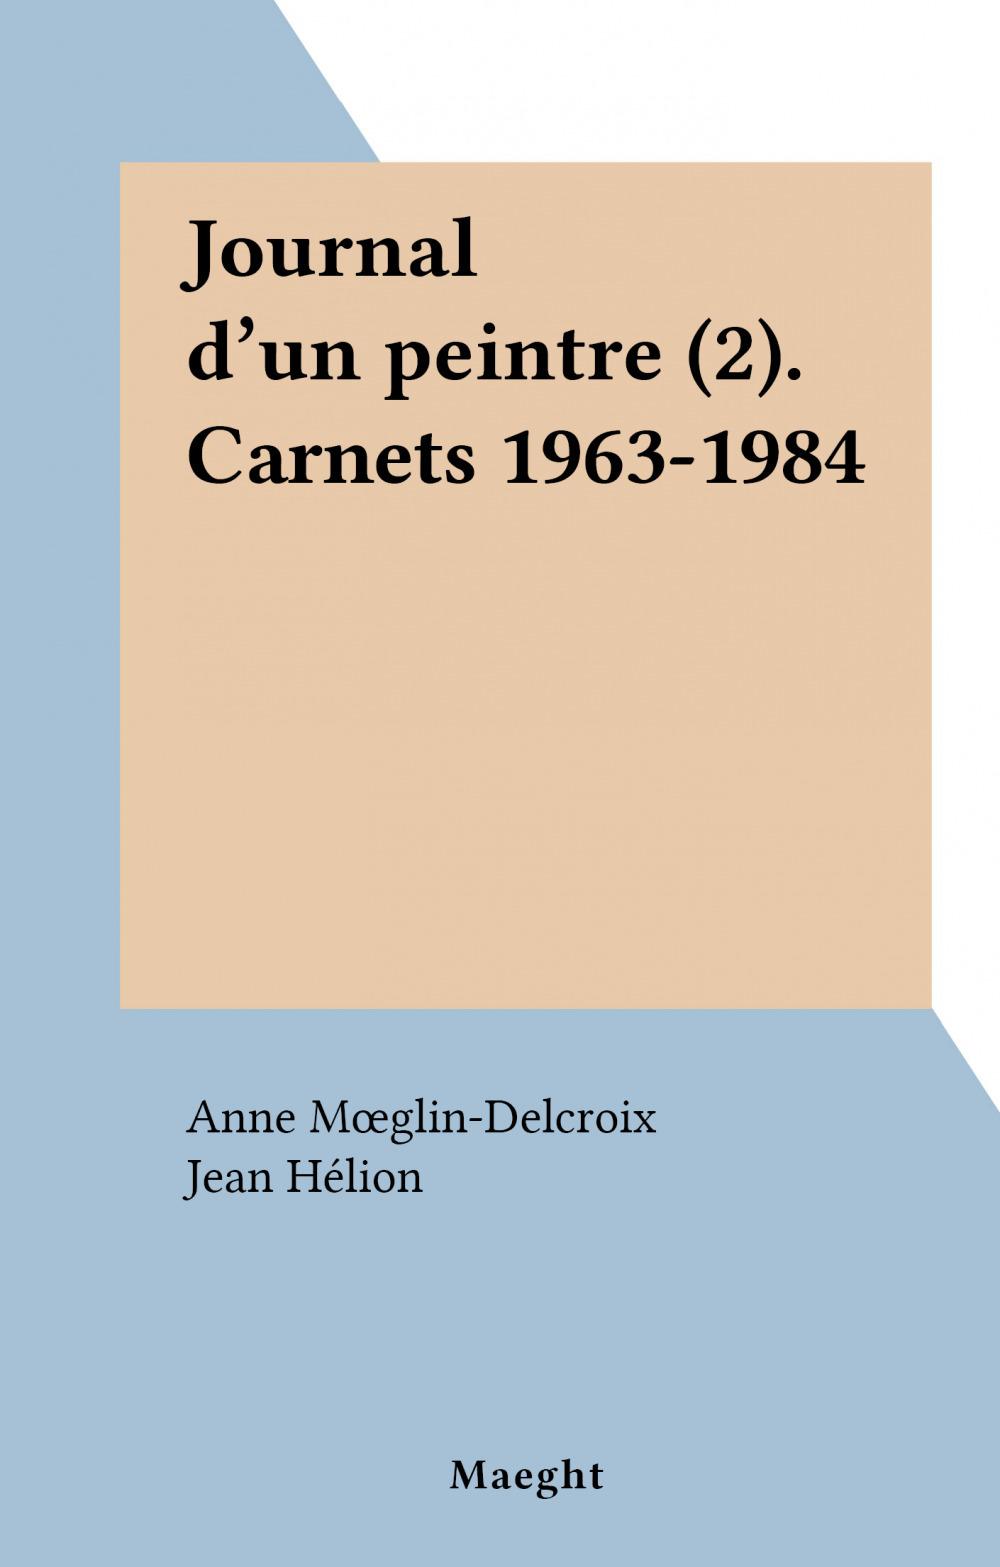 Journal d'un peintre (2). Carnets 1963-1984